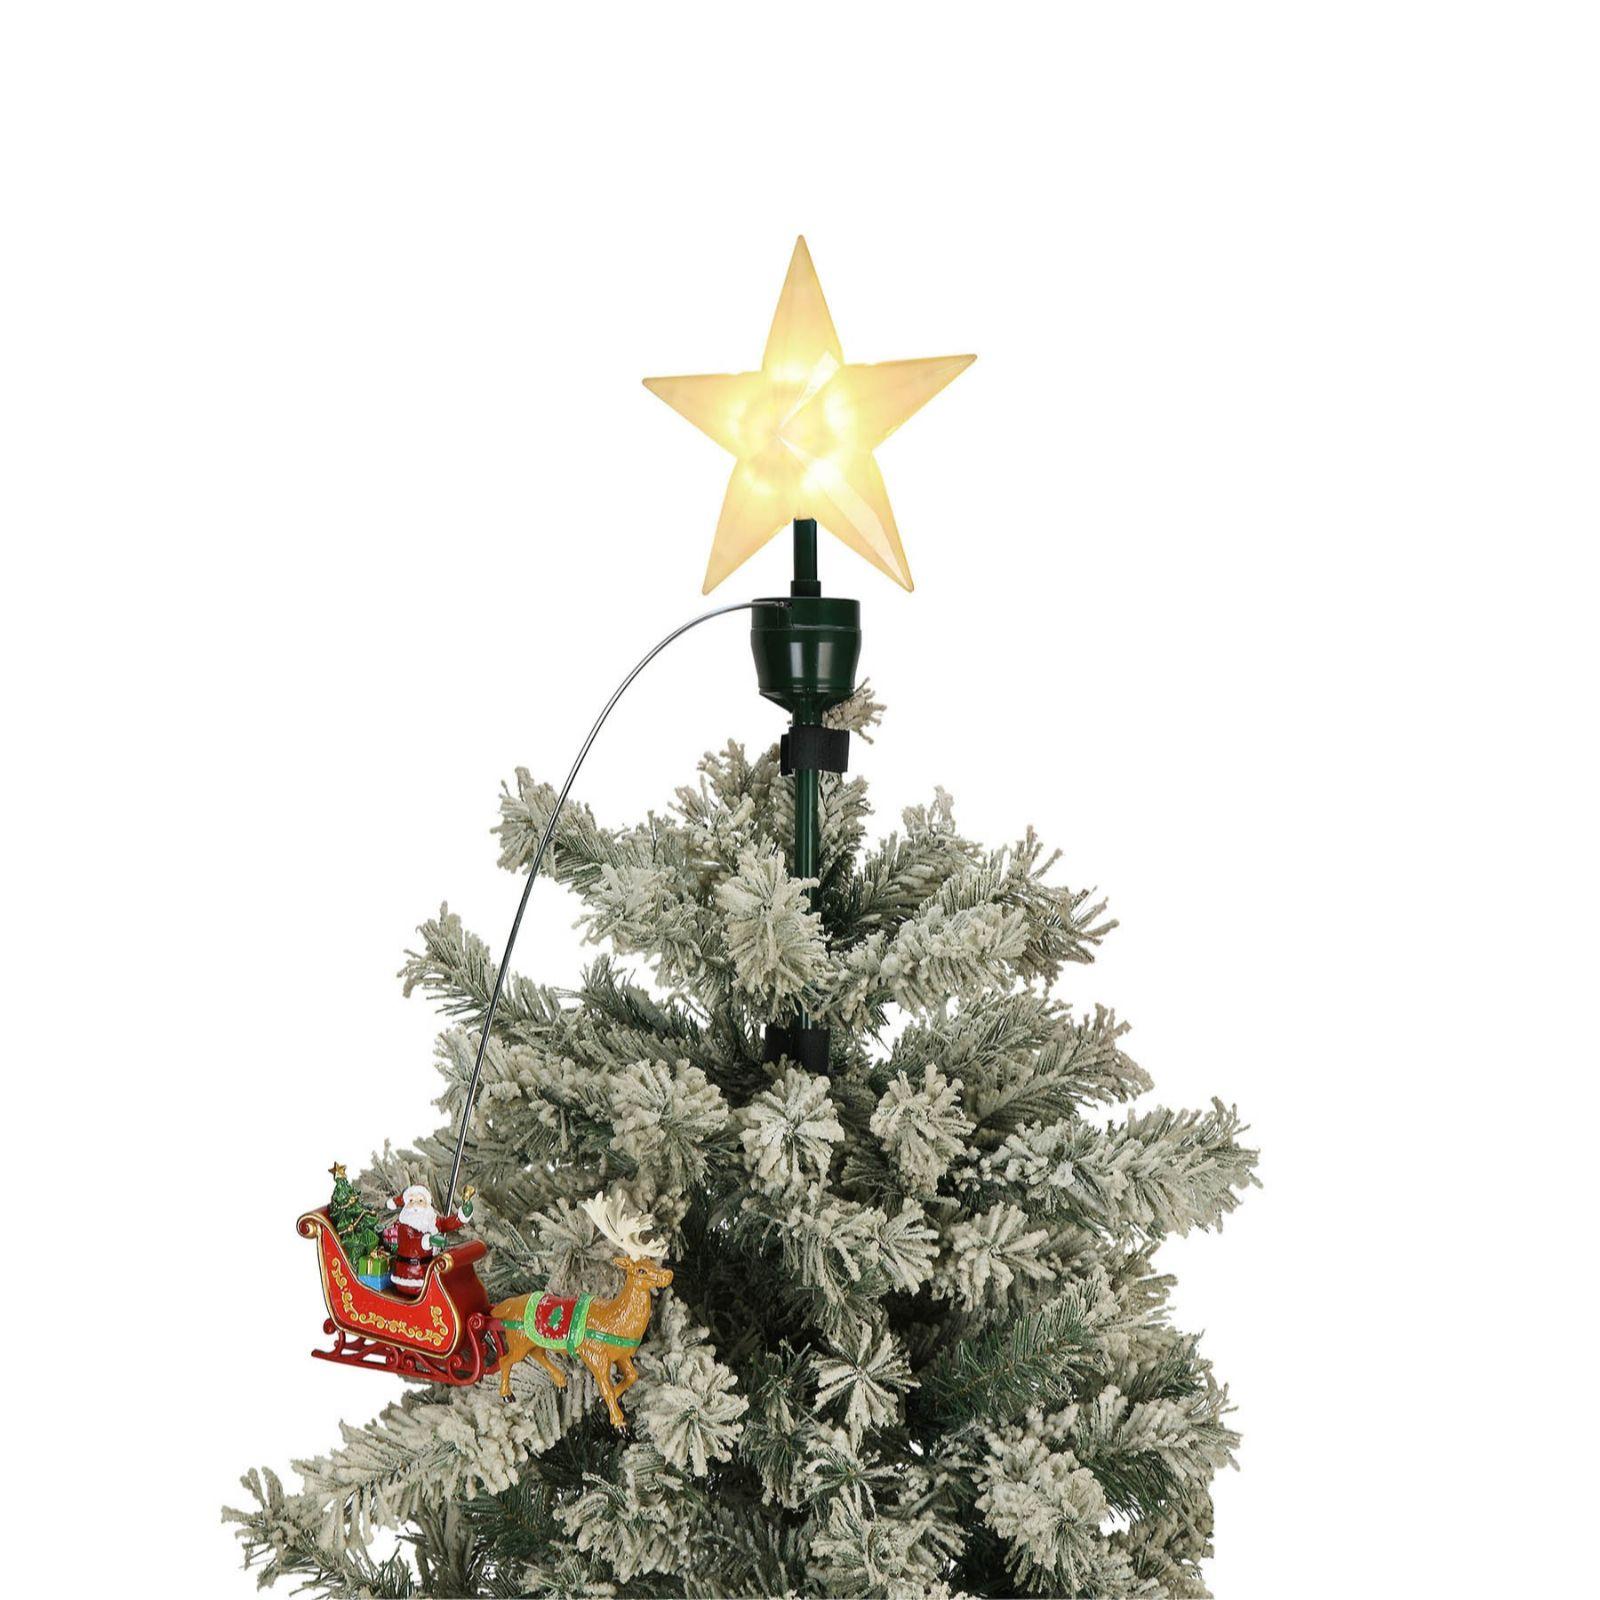 Qvc Christmas.Mr Christmas Animated Tree Topper Qvc Uk